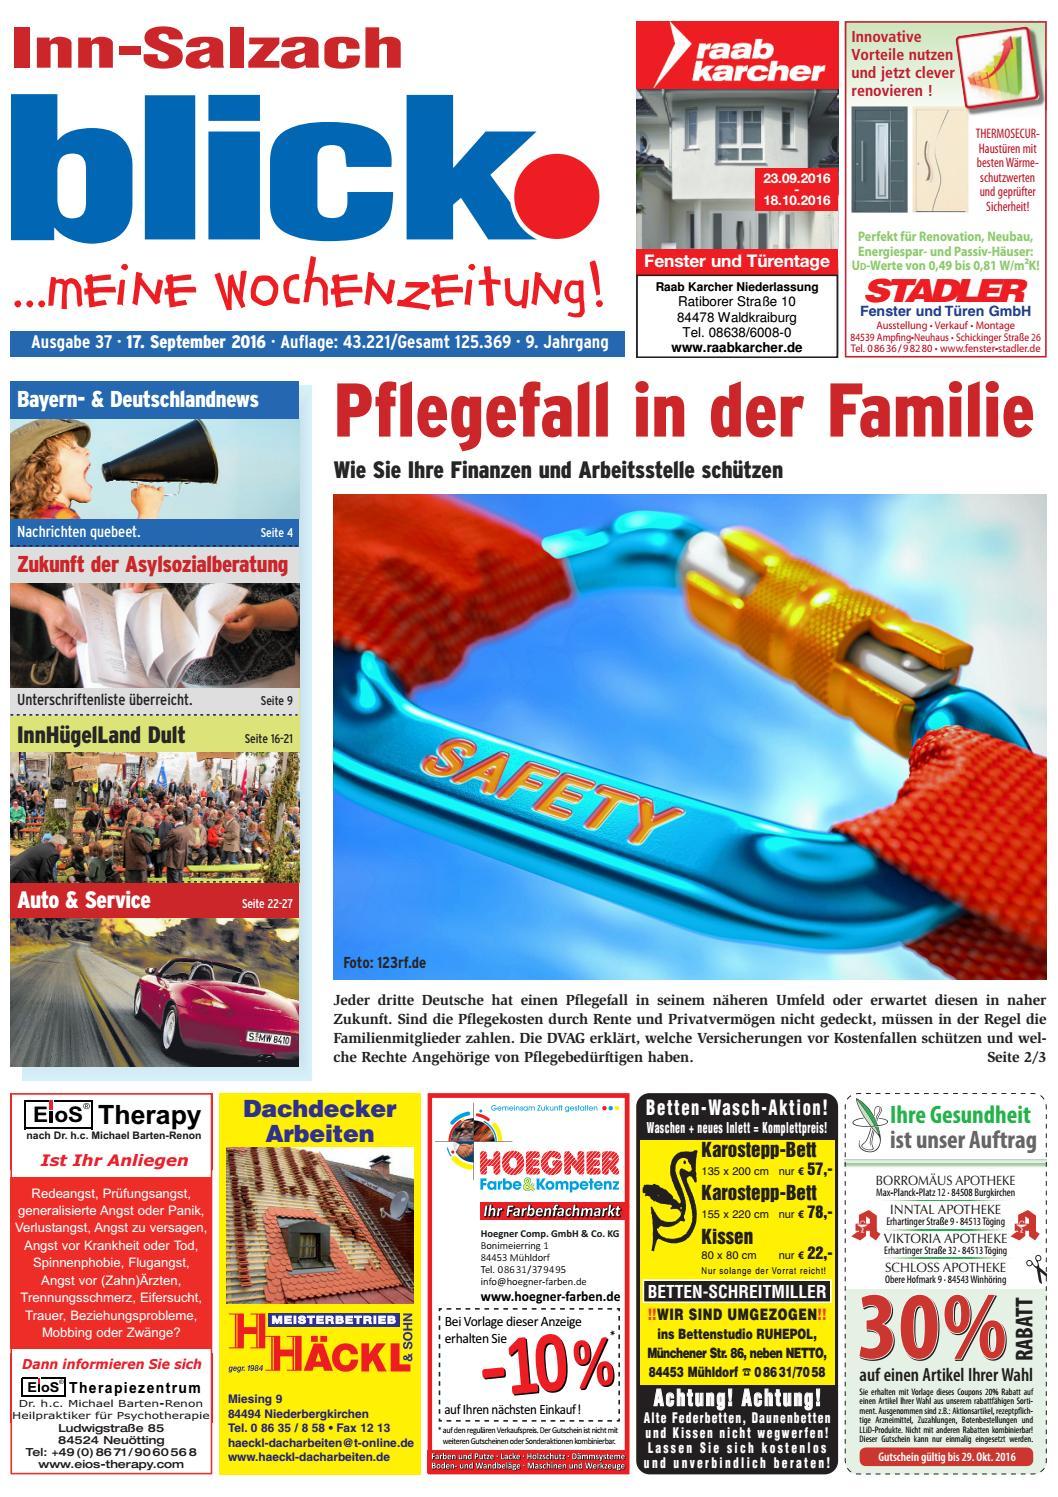 Inn-Salzach blick - Ausgabe 37 | 2016 by Blickpunkt Verlag - issuu